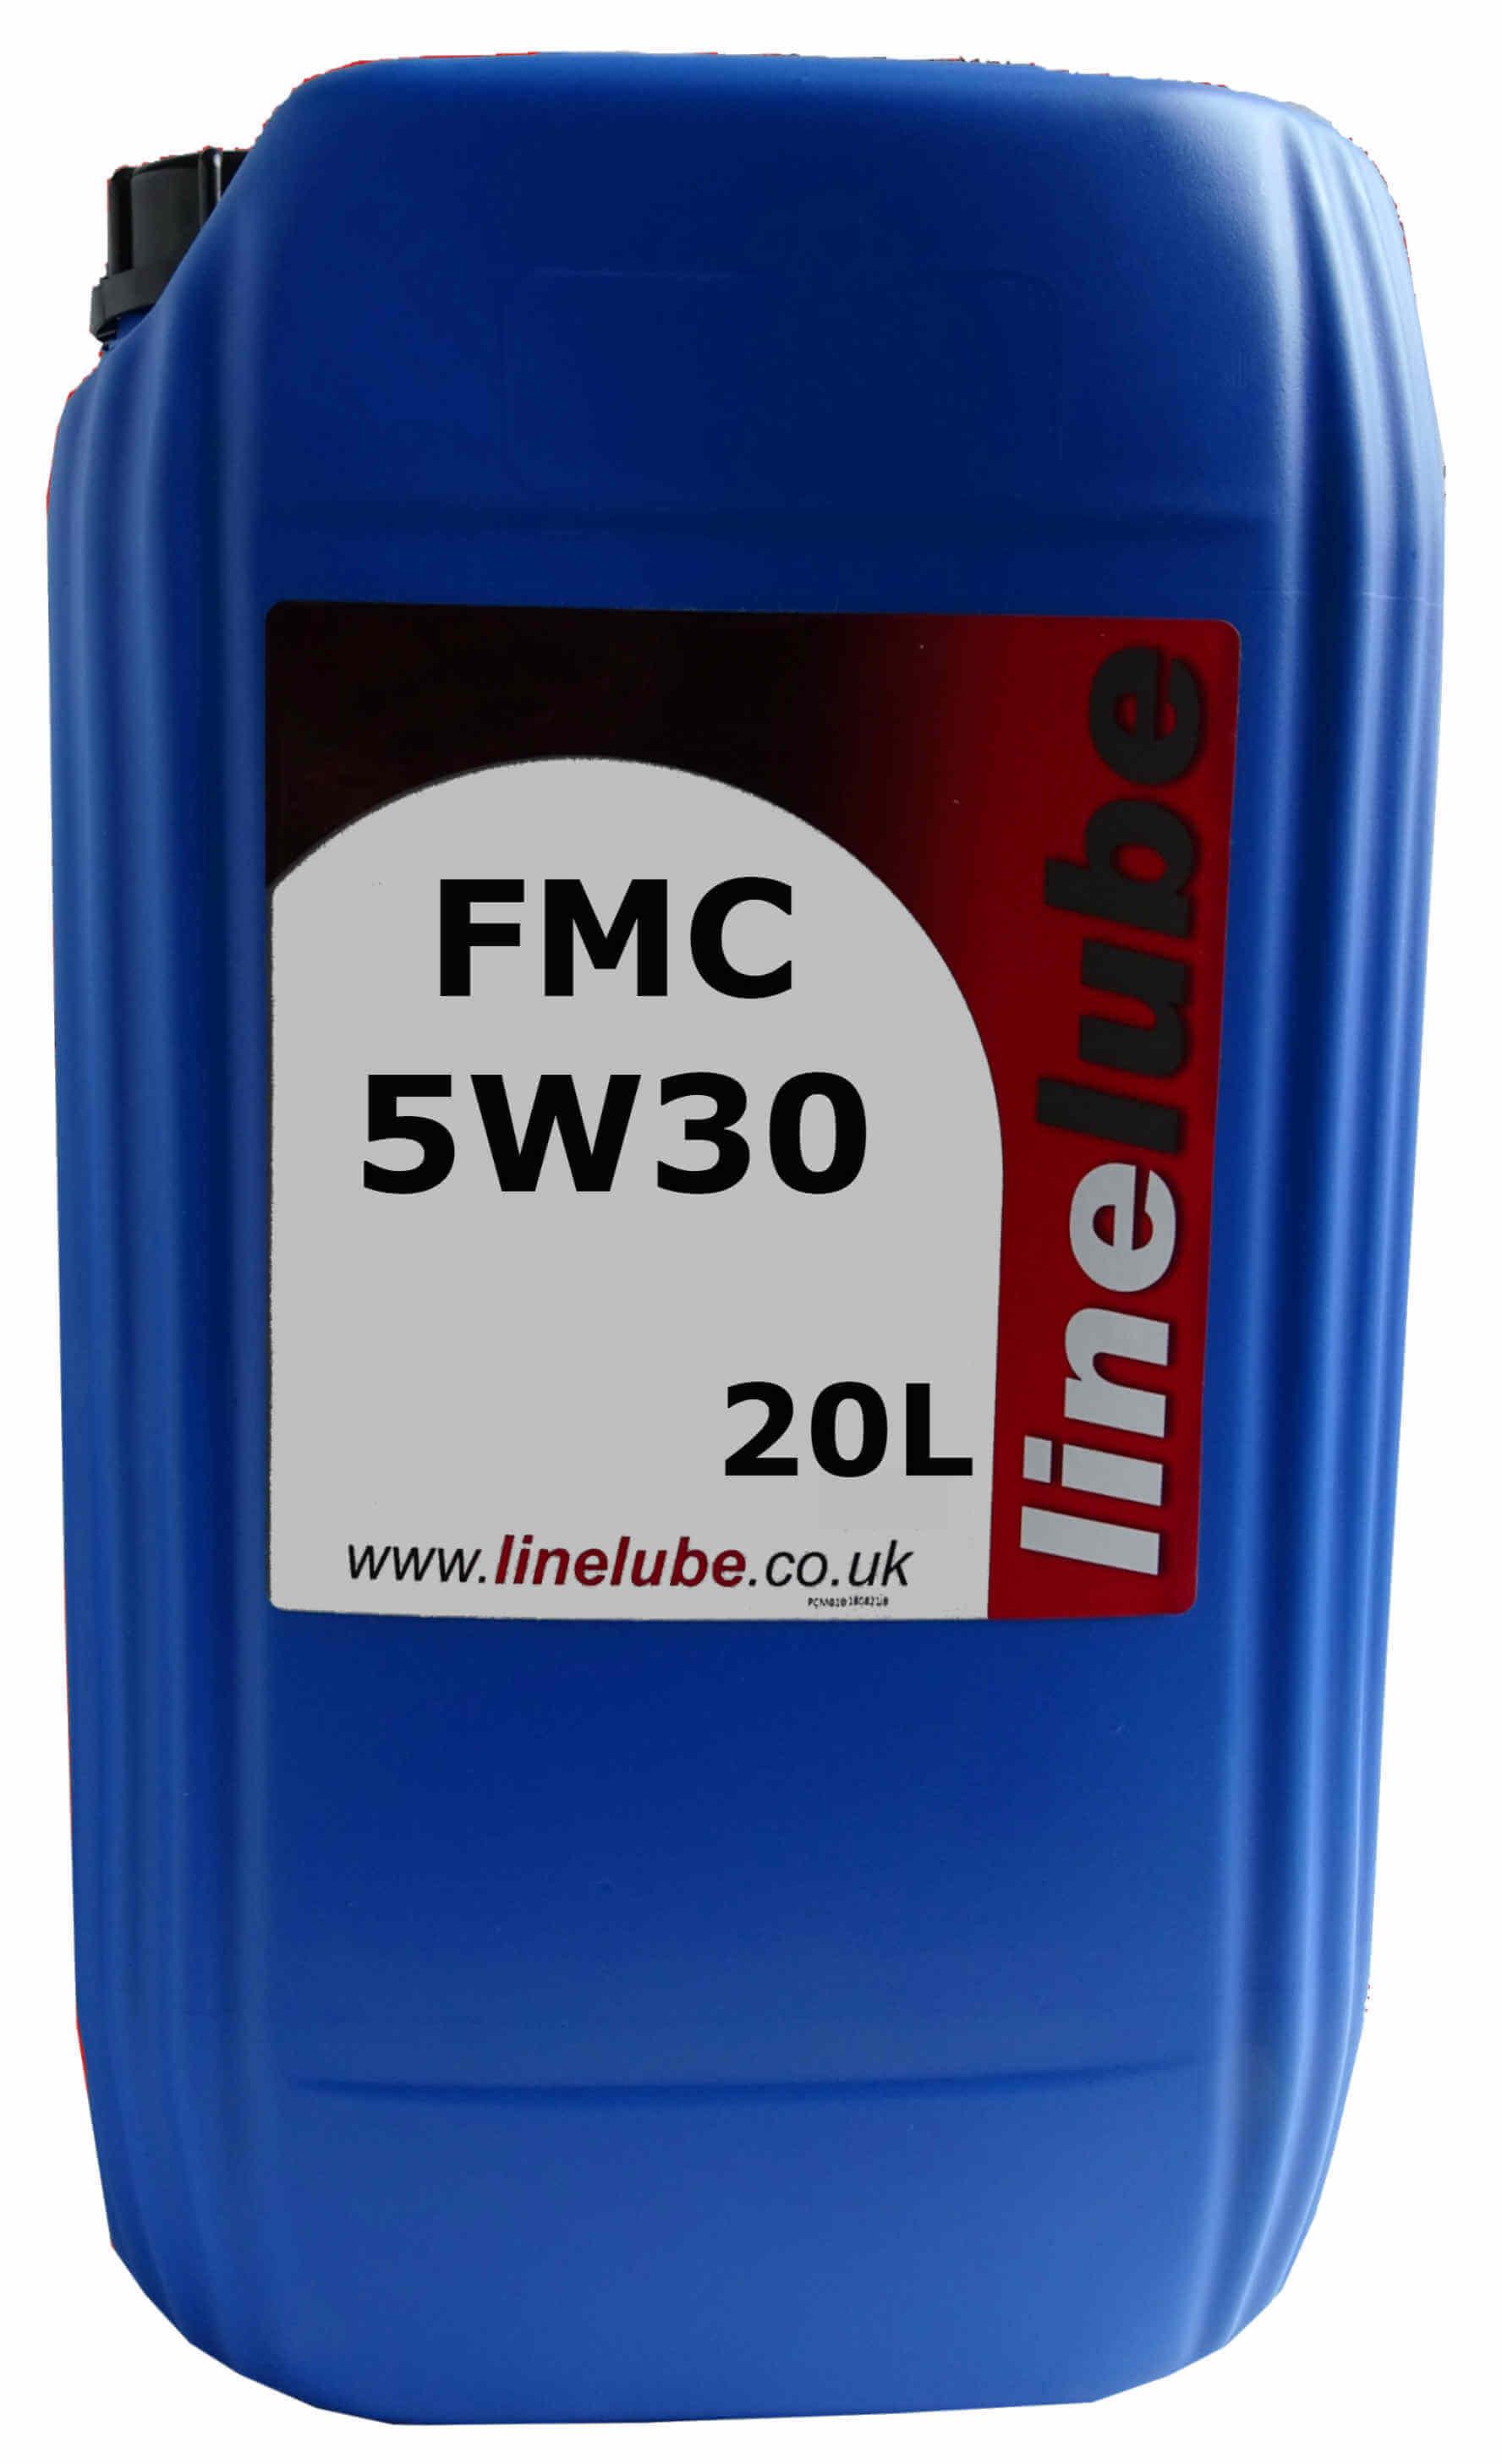 linelube FMC 5W-30